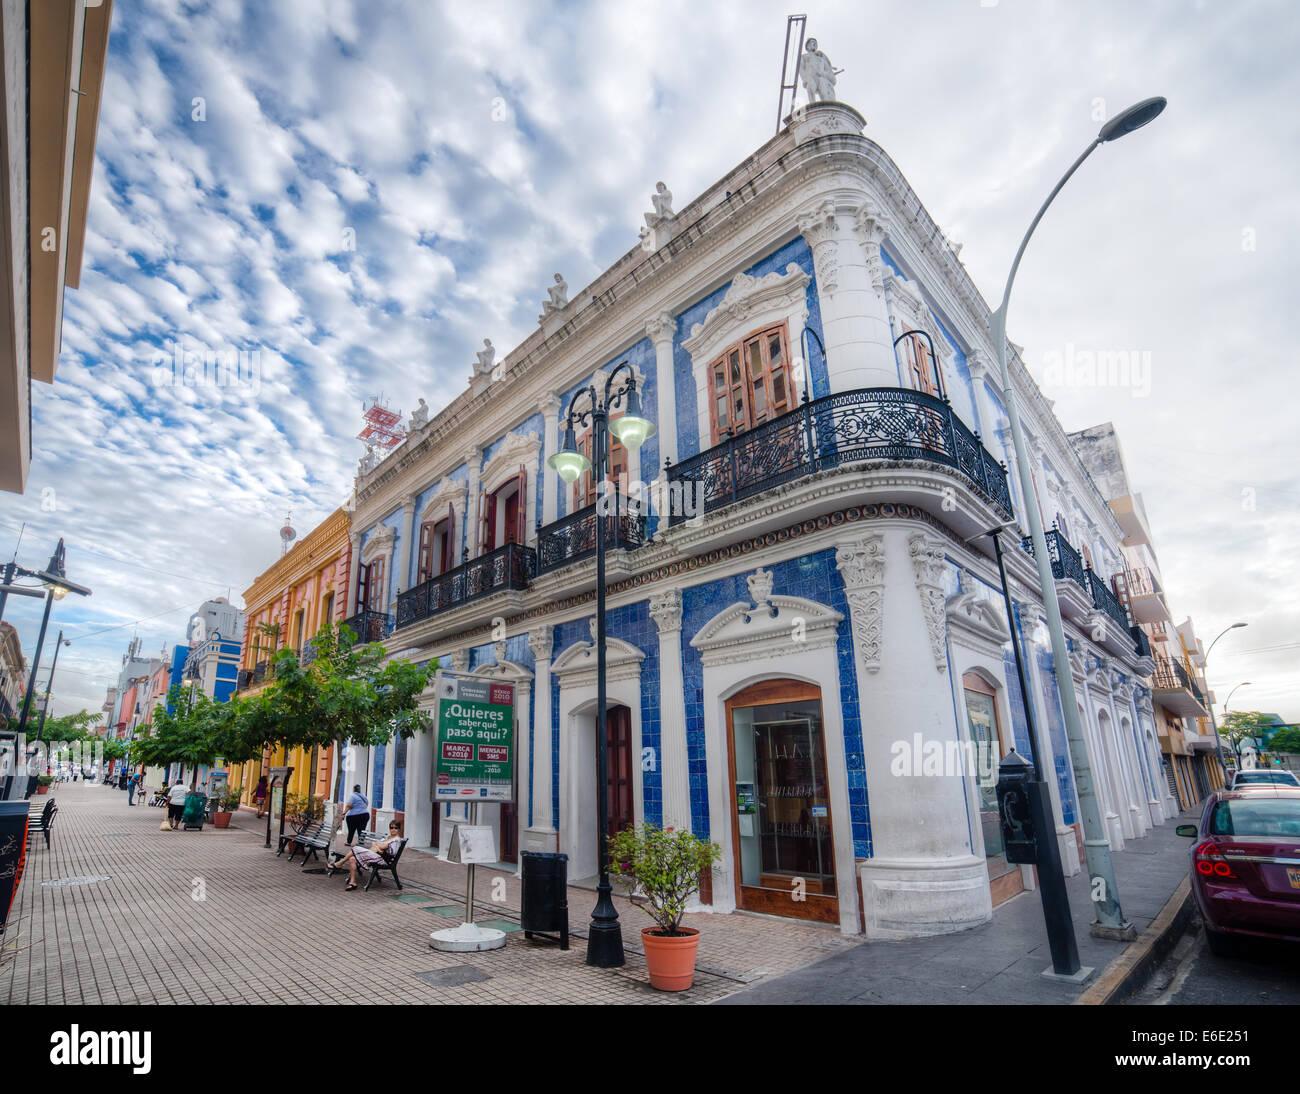 House of tiles in the zona luz neighborhood of for Casa de los azulejos villahermosa